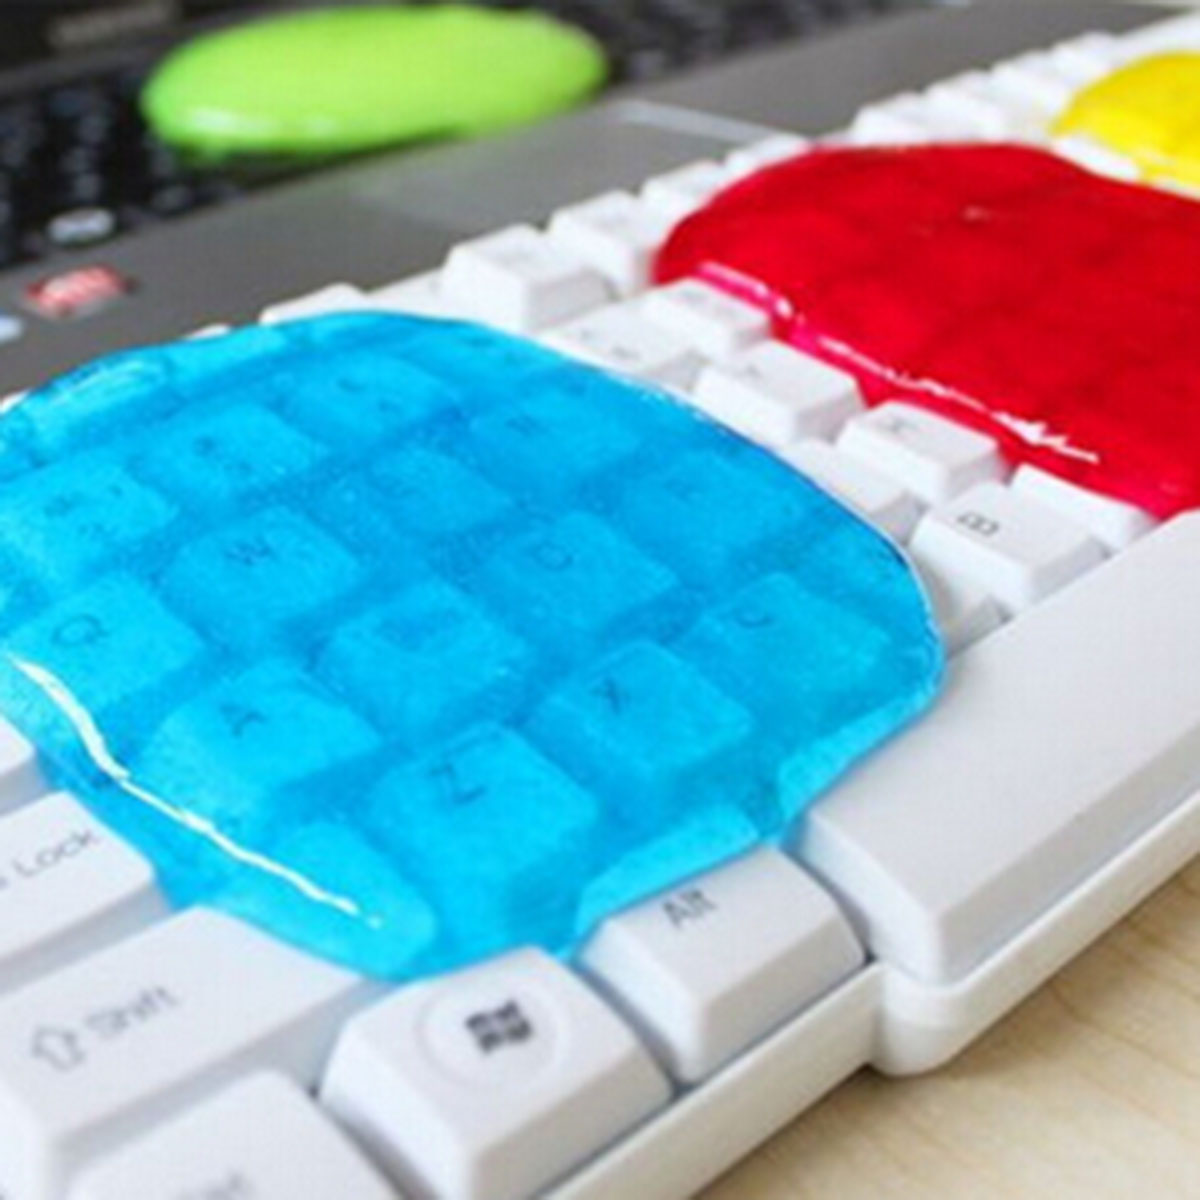 10PCS Magic Dust Cleaner Compound Super Clean Slijmerige Gel Voor Telefoon Laptop Pc Computer Toetsenbord